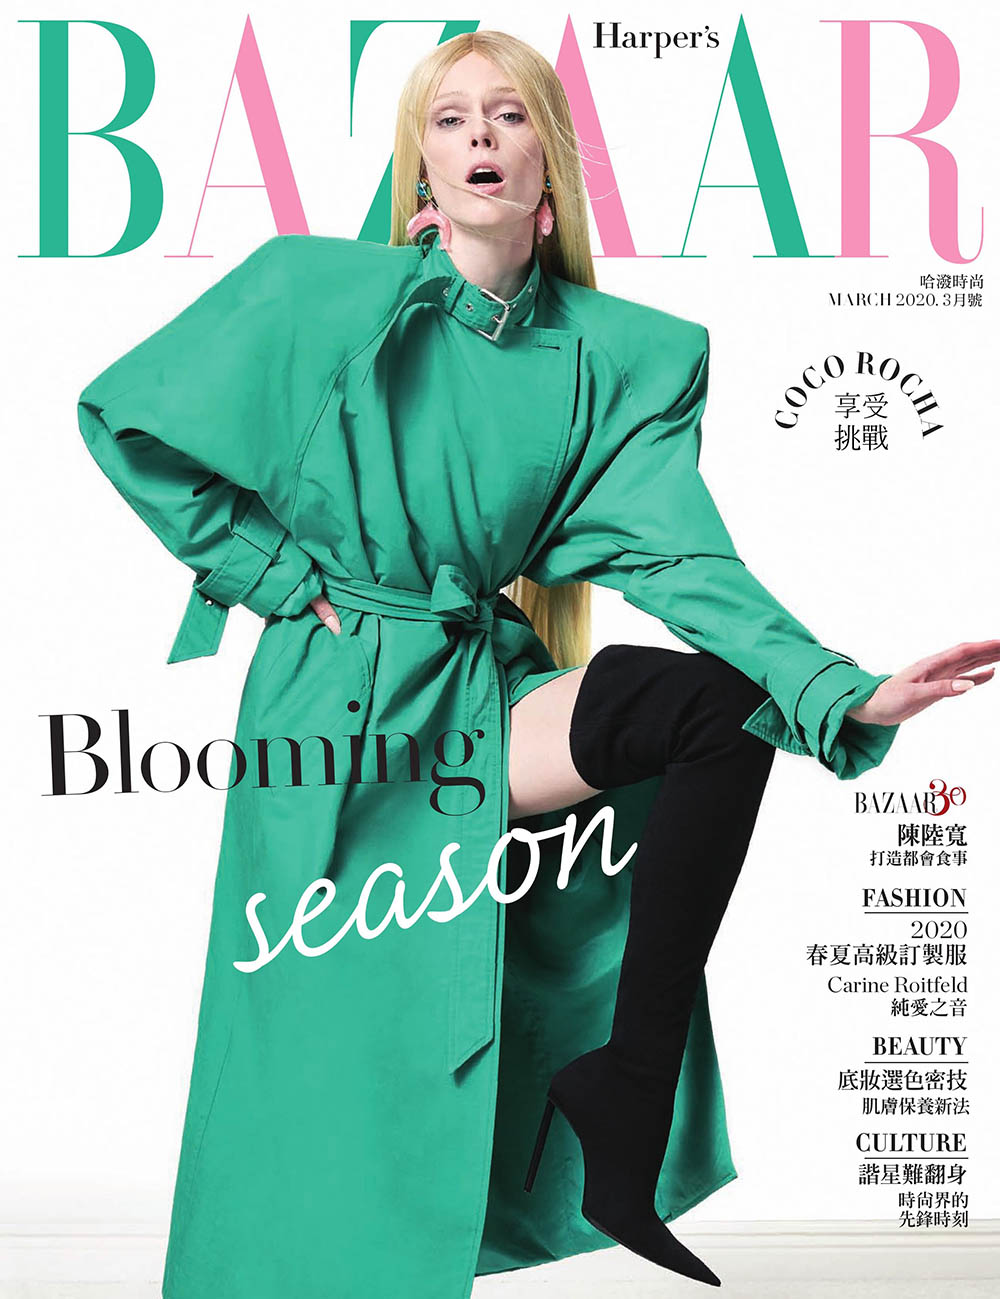 Coco Rocha covers Harper's Bazaar Taiwan March 2020 by Ungano + Agriodimas